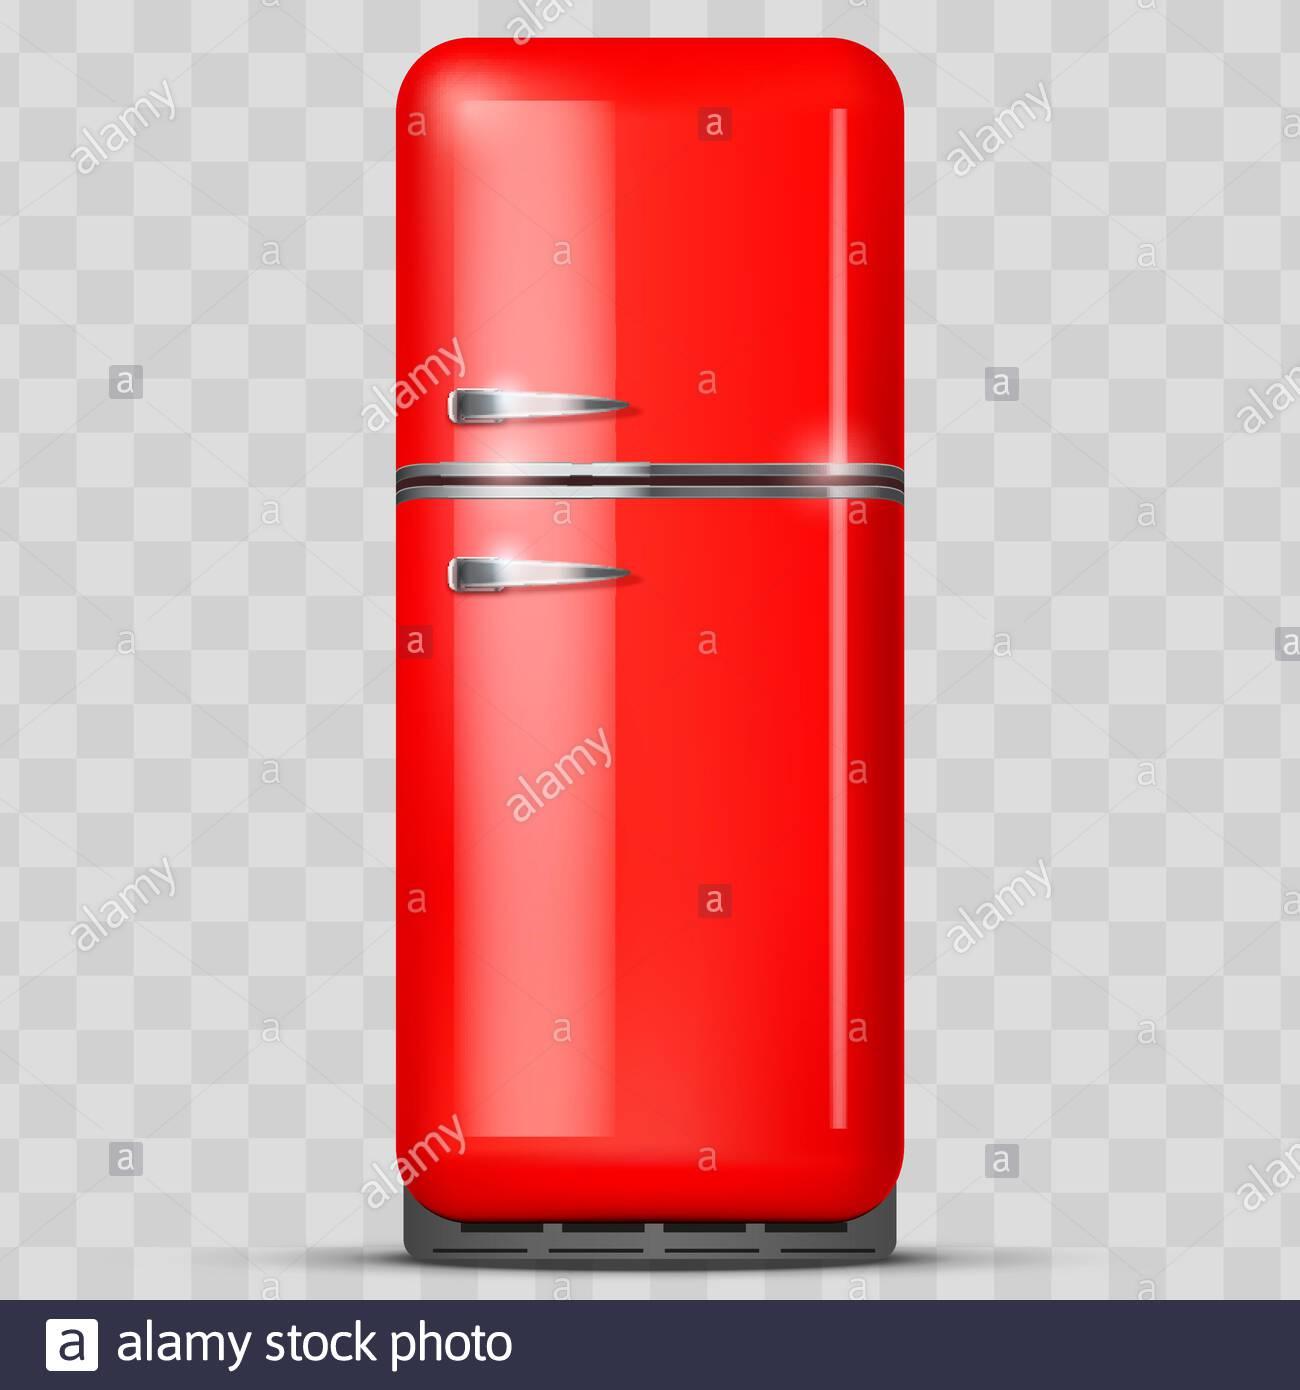 Vintage Fridge refrigerator Vector isolated on white background 1300x1390